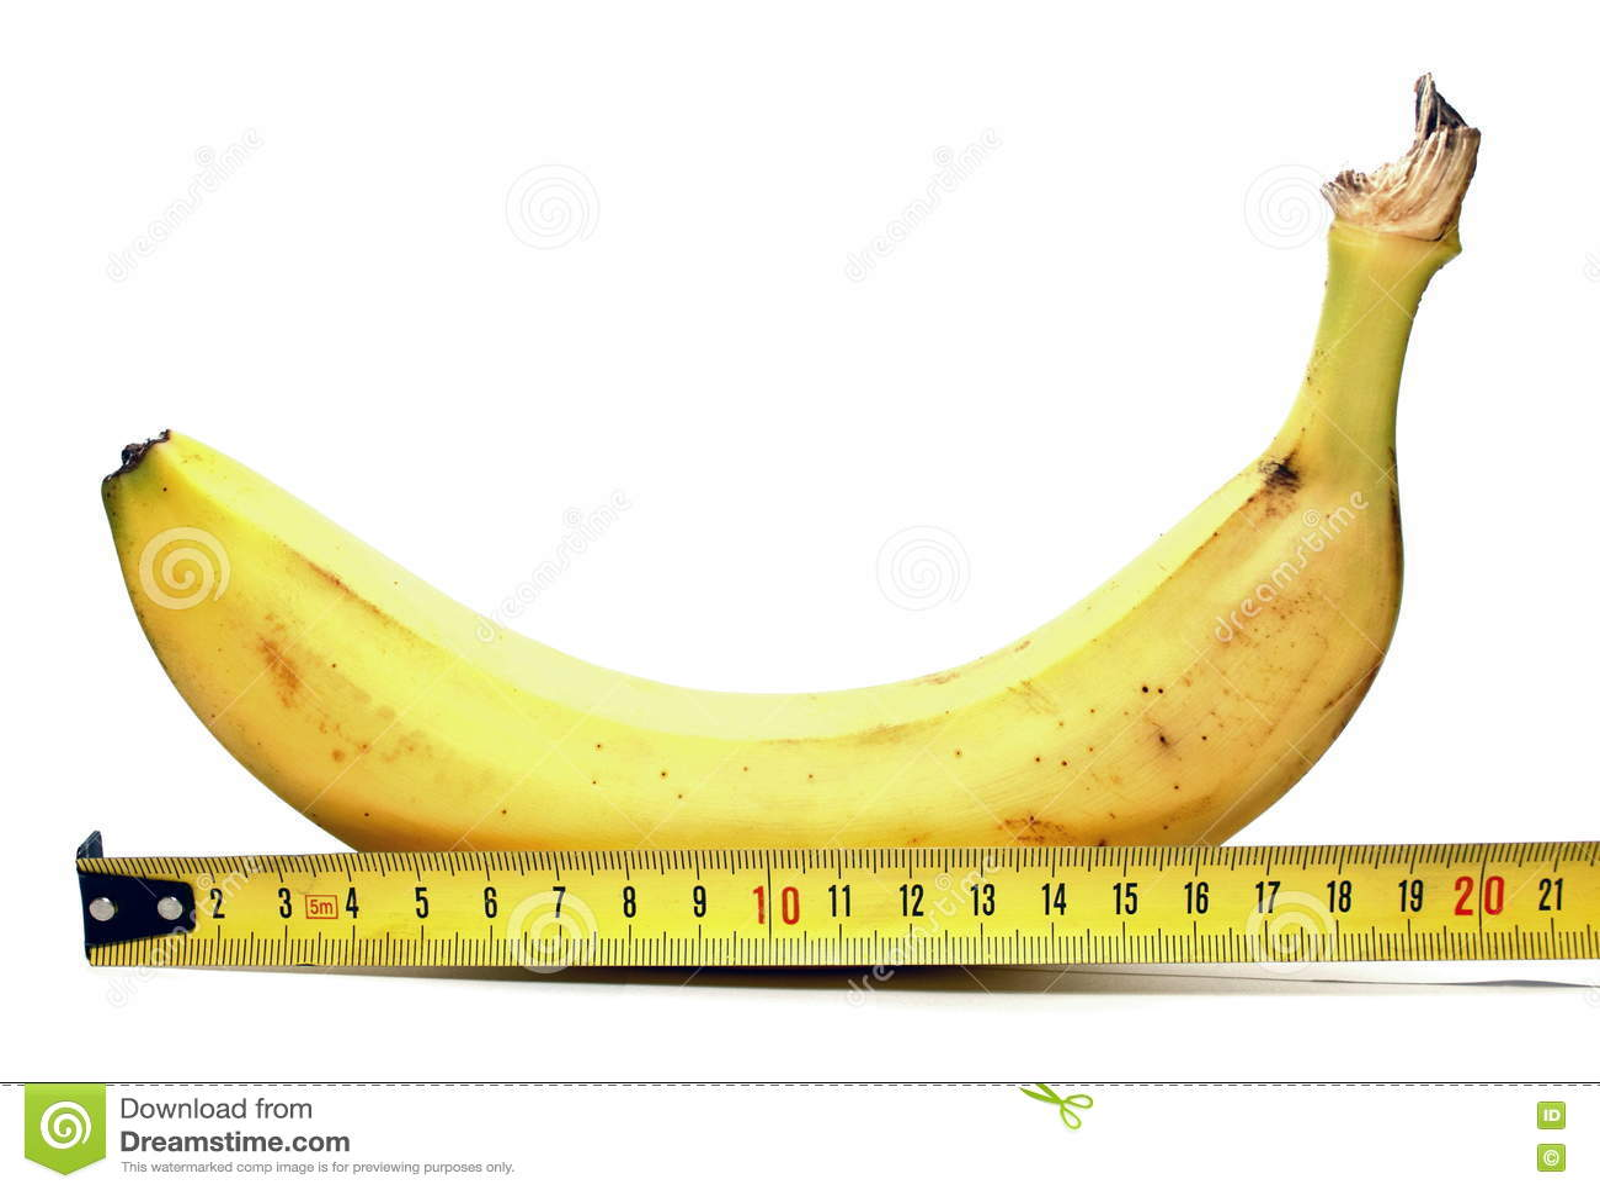 Länge messen penis Penis Größe?